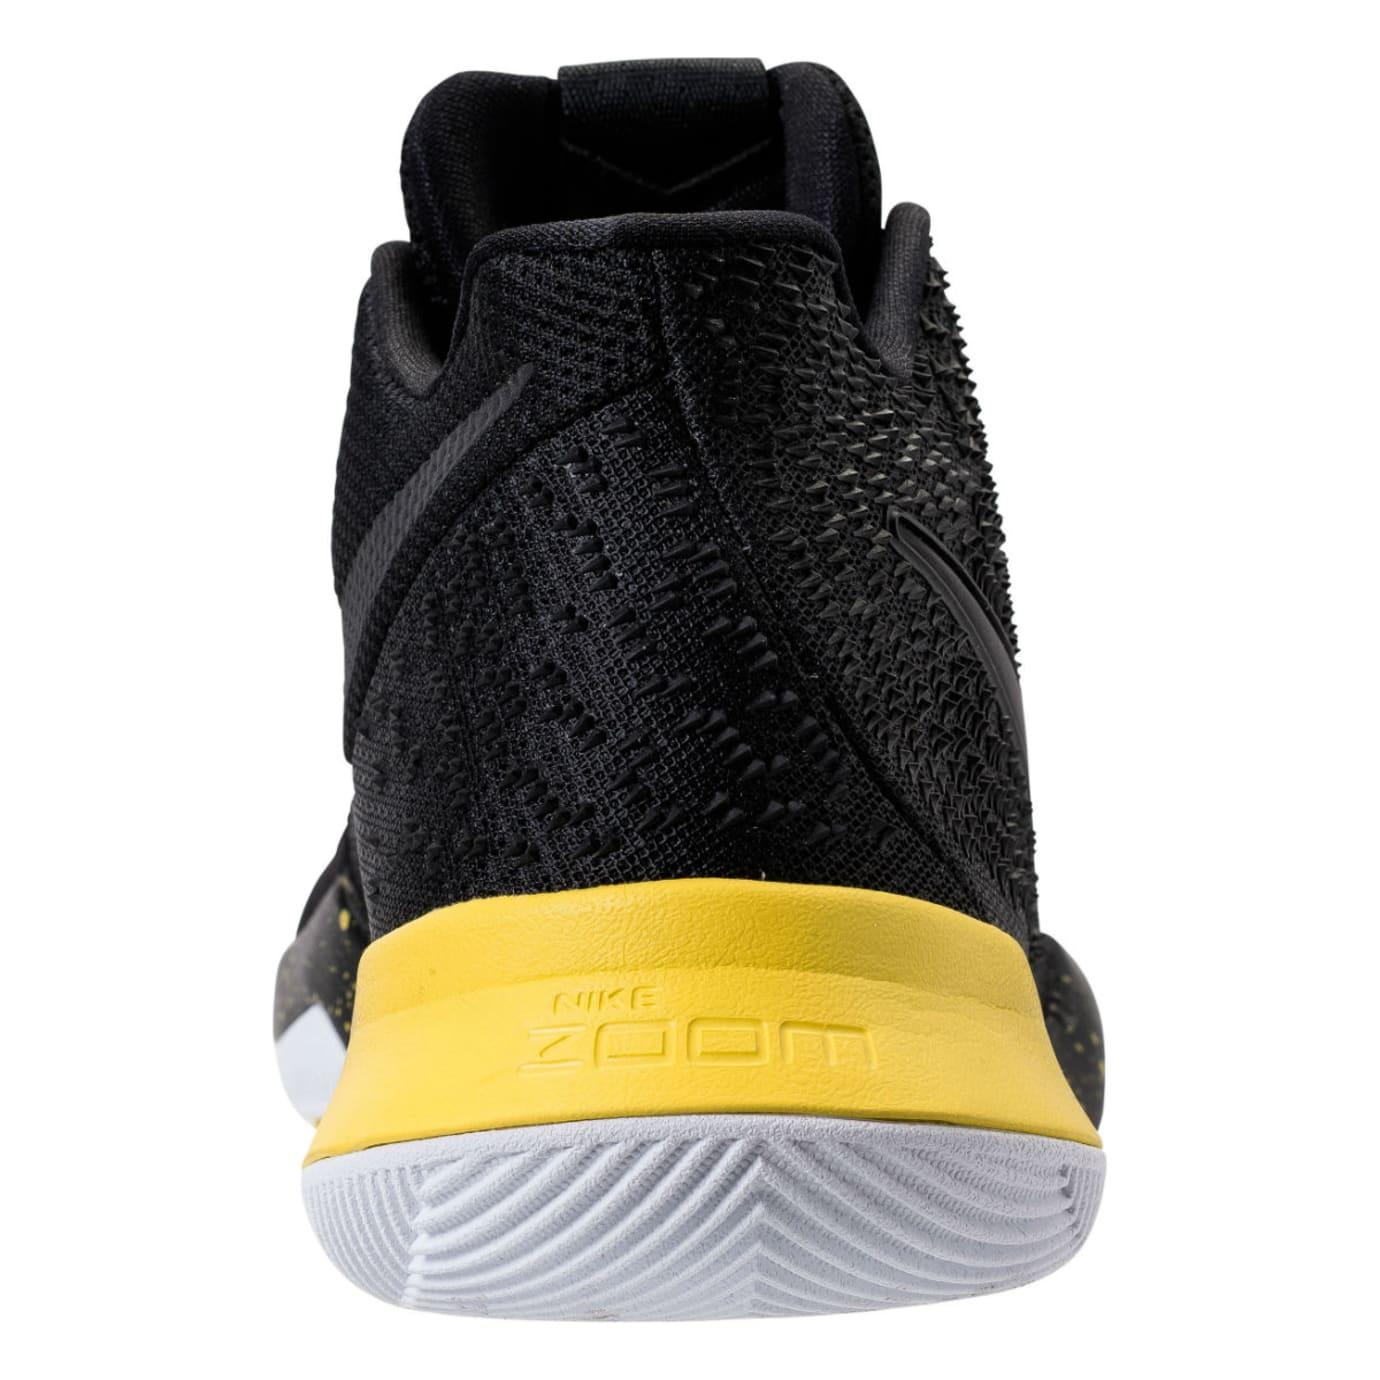 Nike Kyrie 3 Black/Yellow Release Date Heel 852395-901